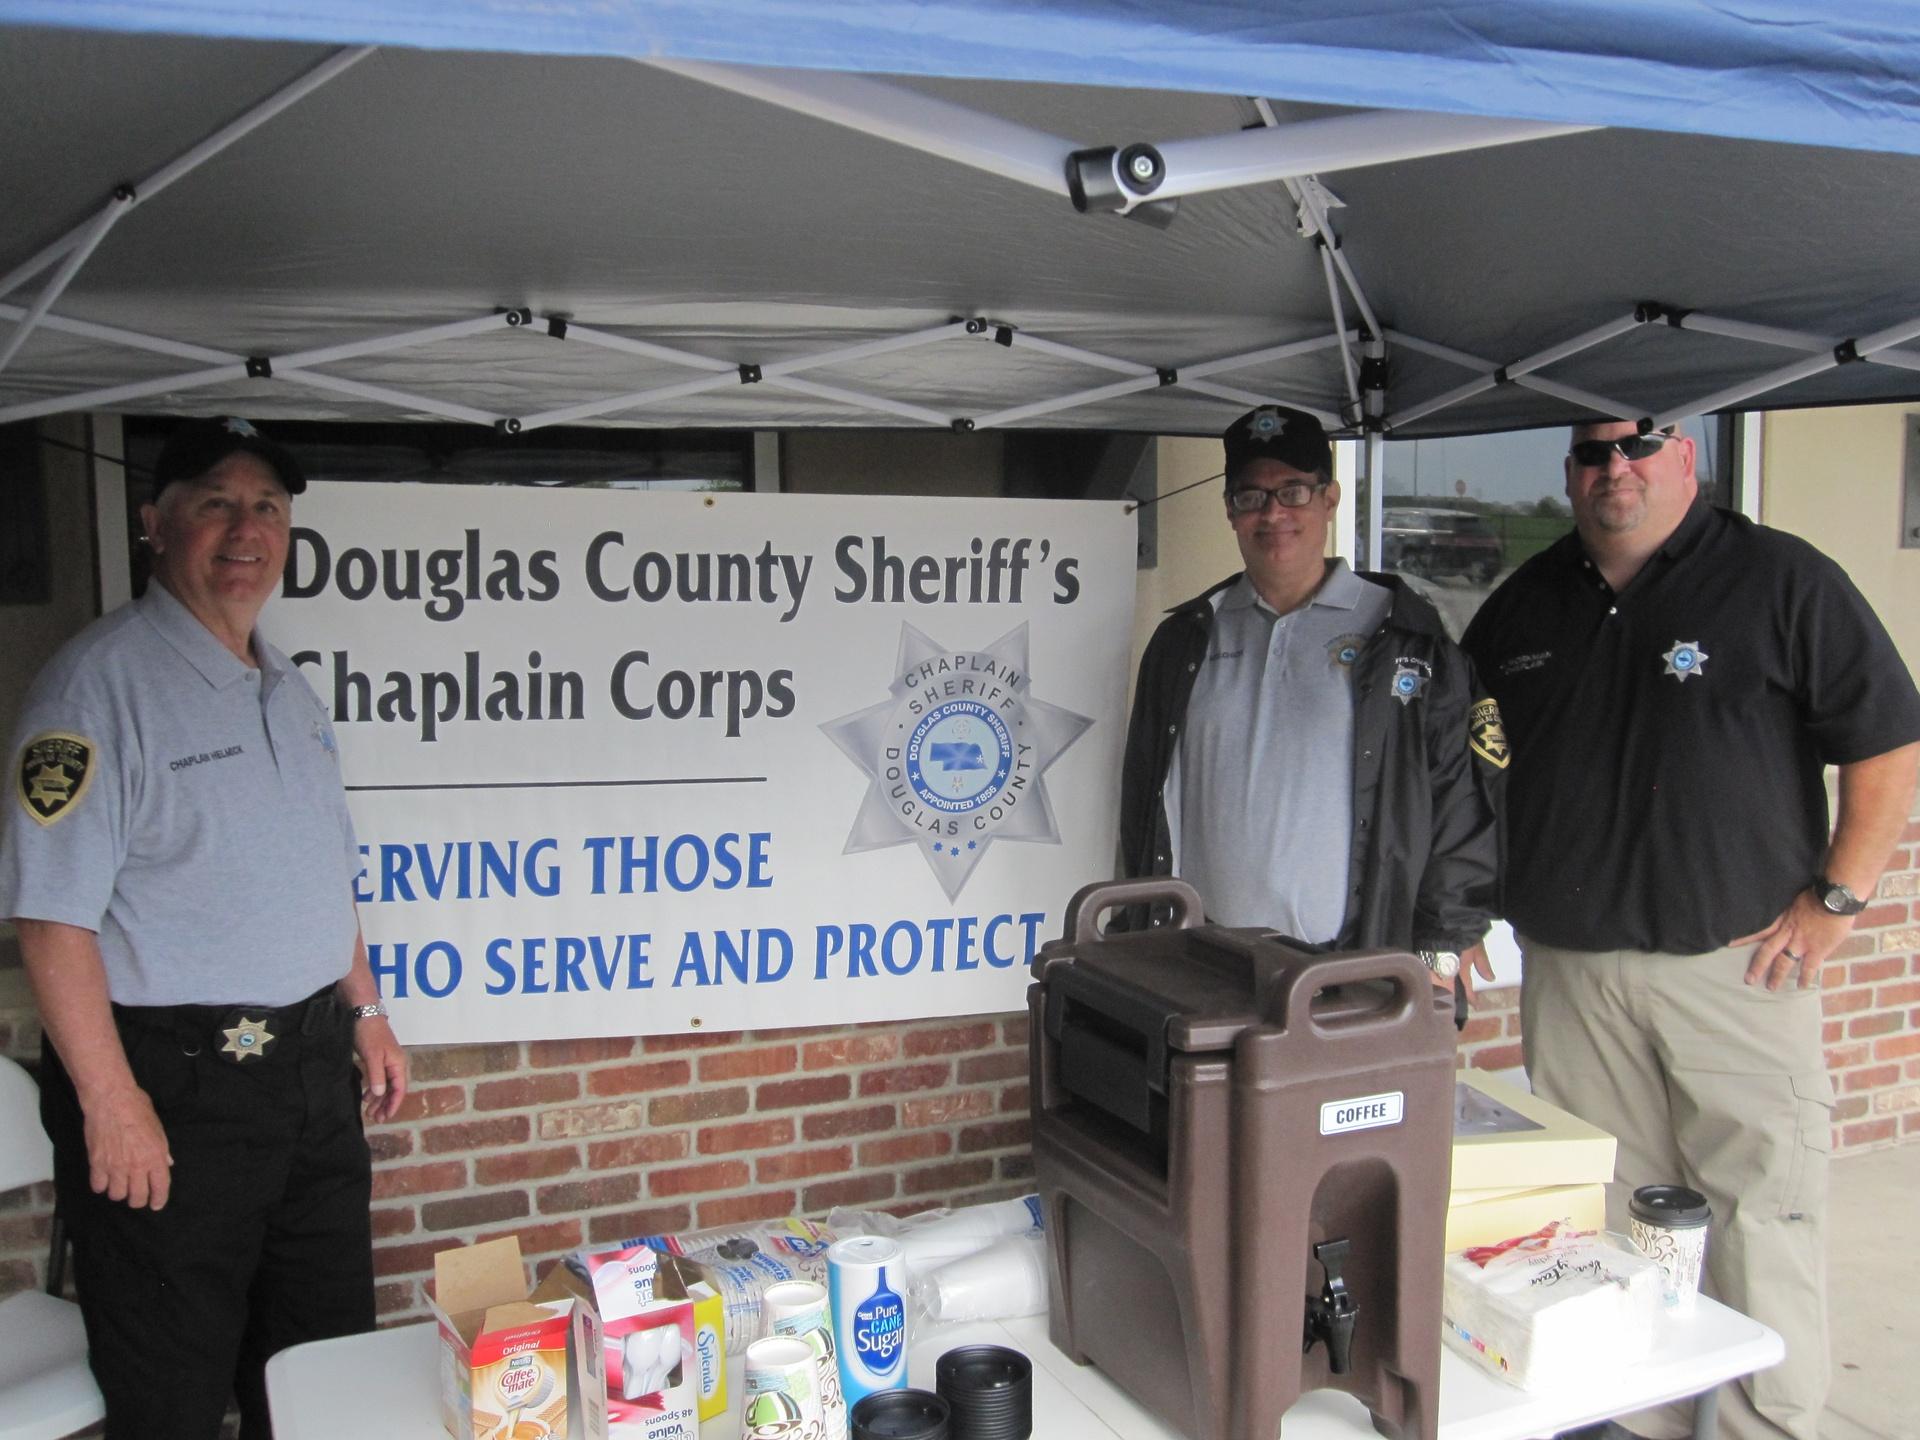 Thank you DCS Chaplain Corps